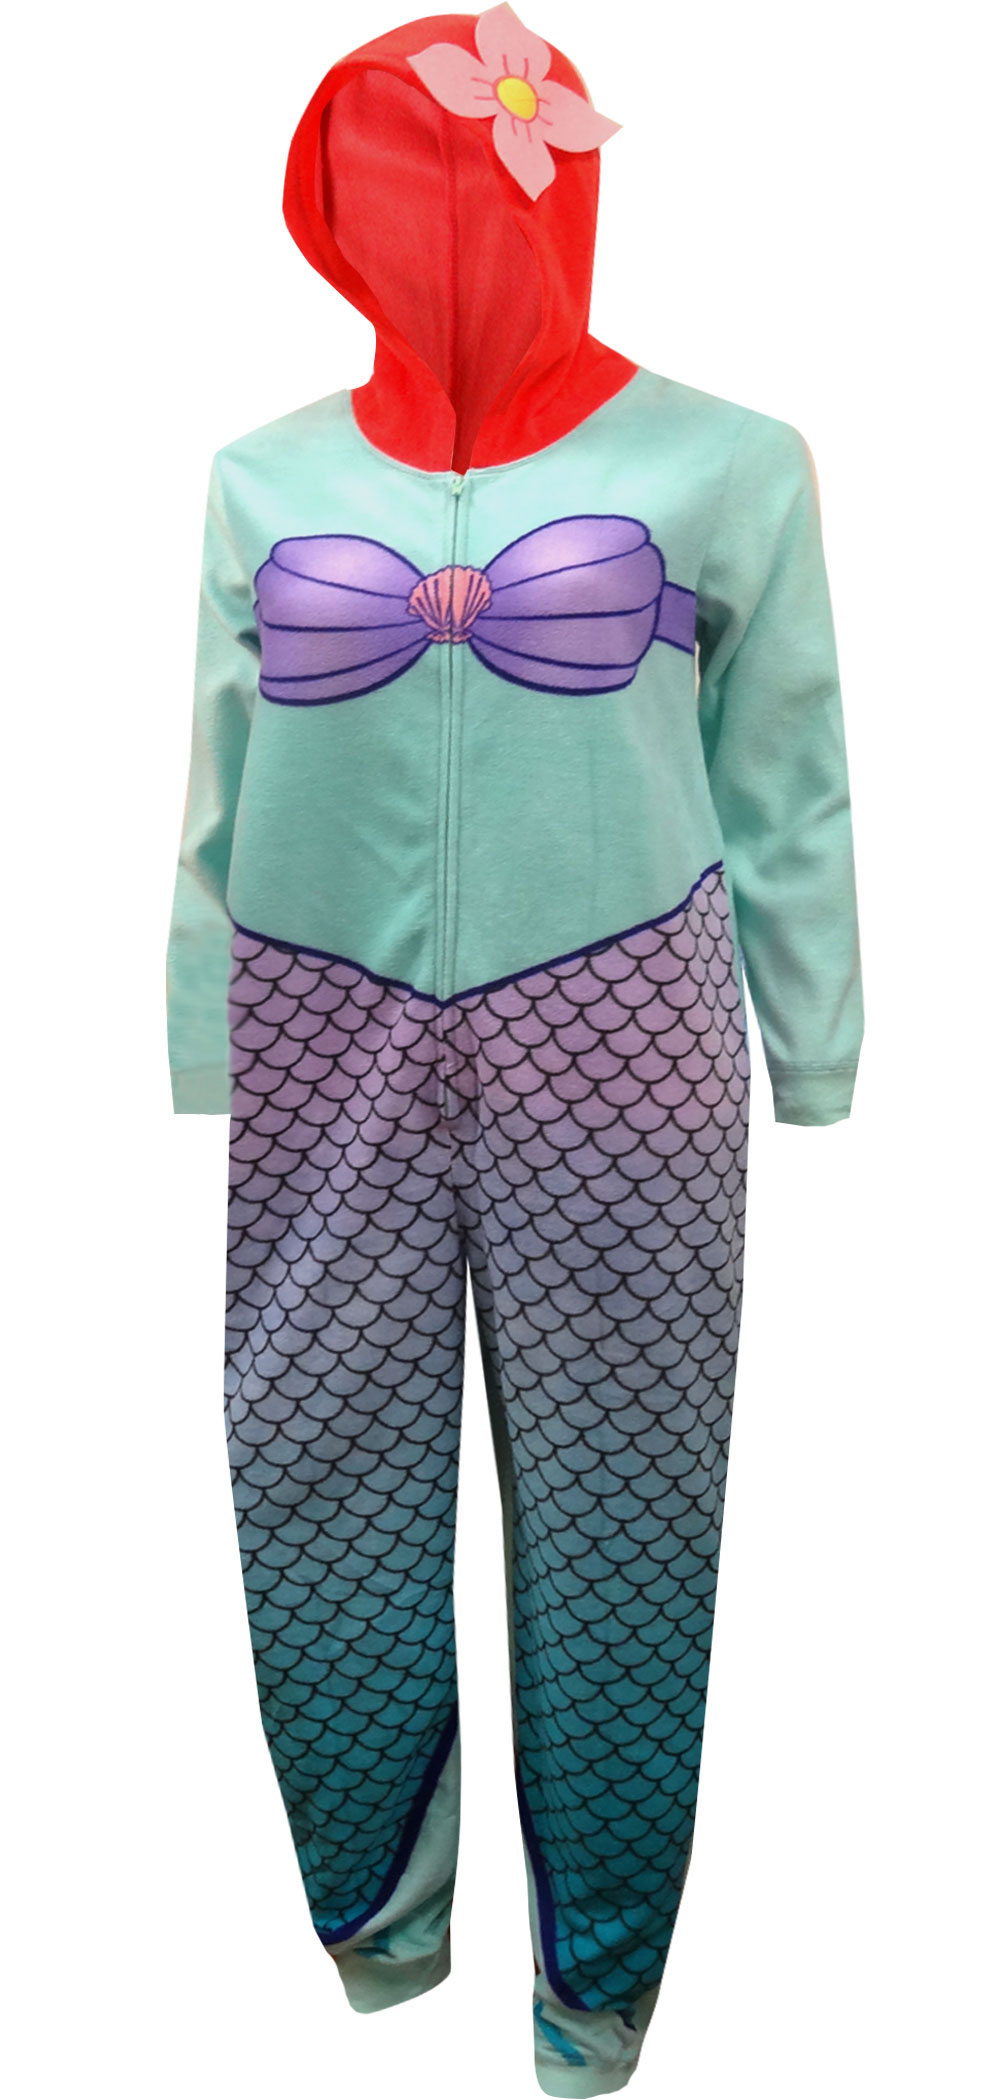 Disney Ariel The Little Mermaid Girls Footed Blanket Sleeper Pajama Size 5T